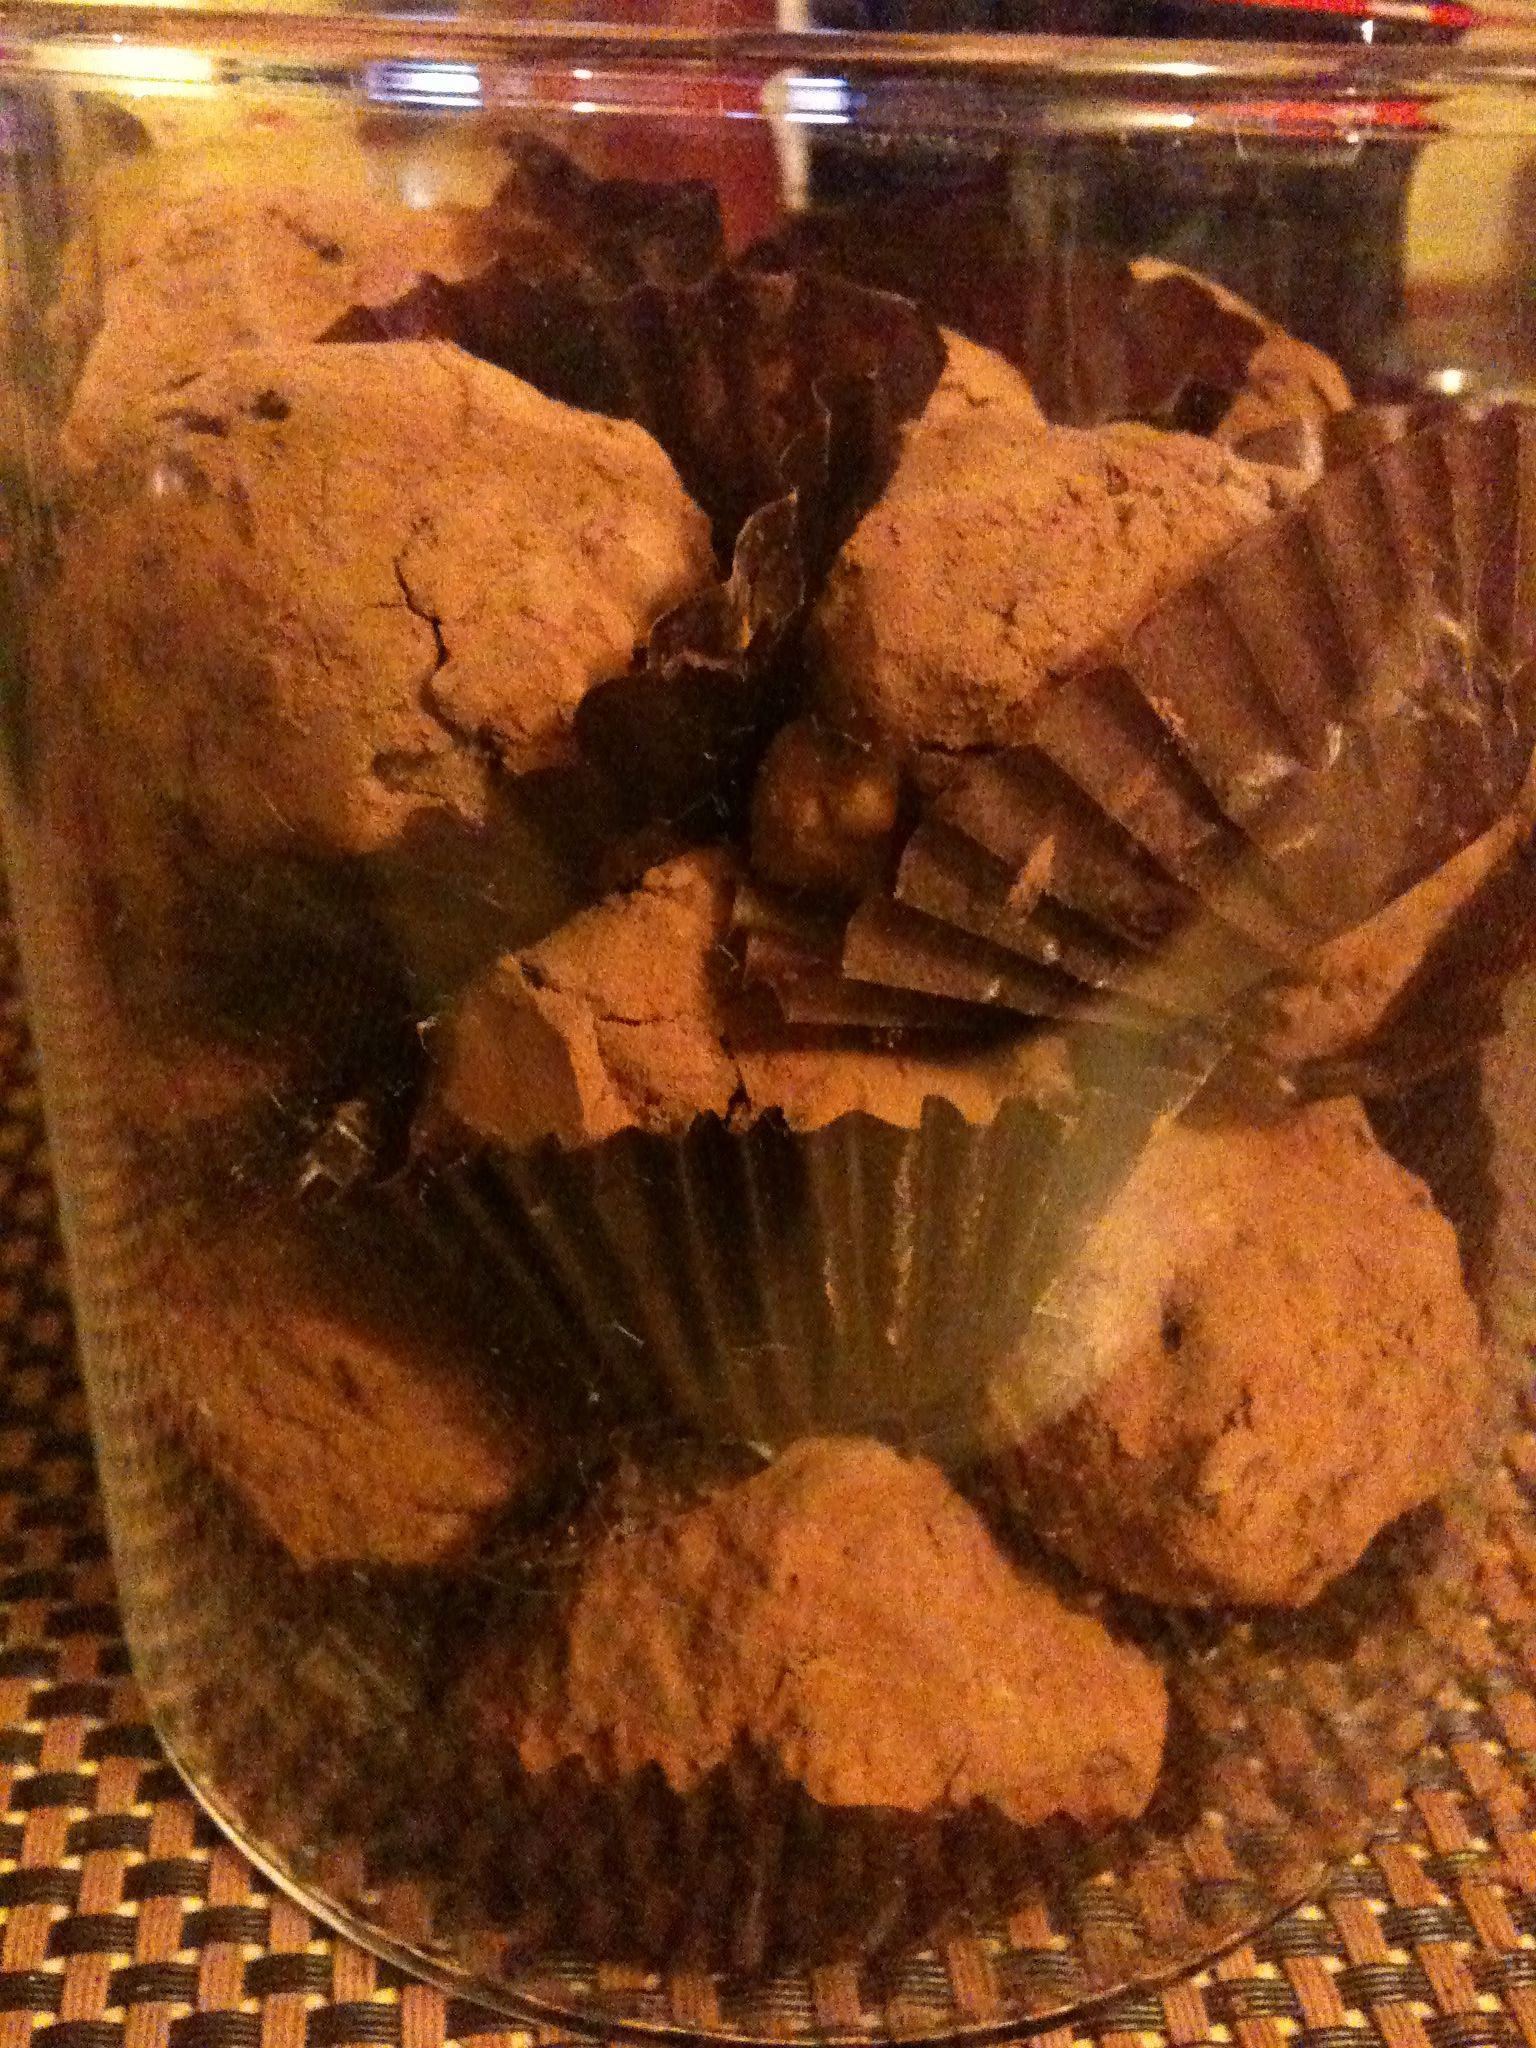 Chocolate truffes